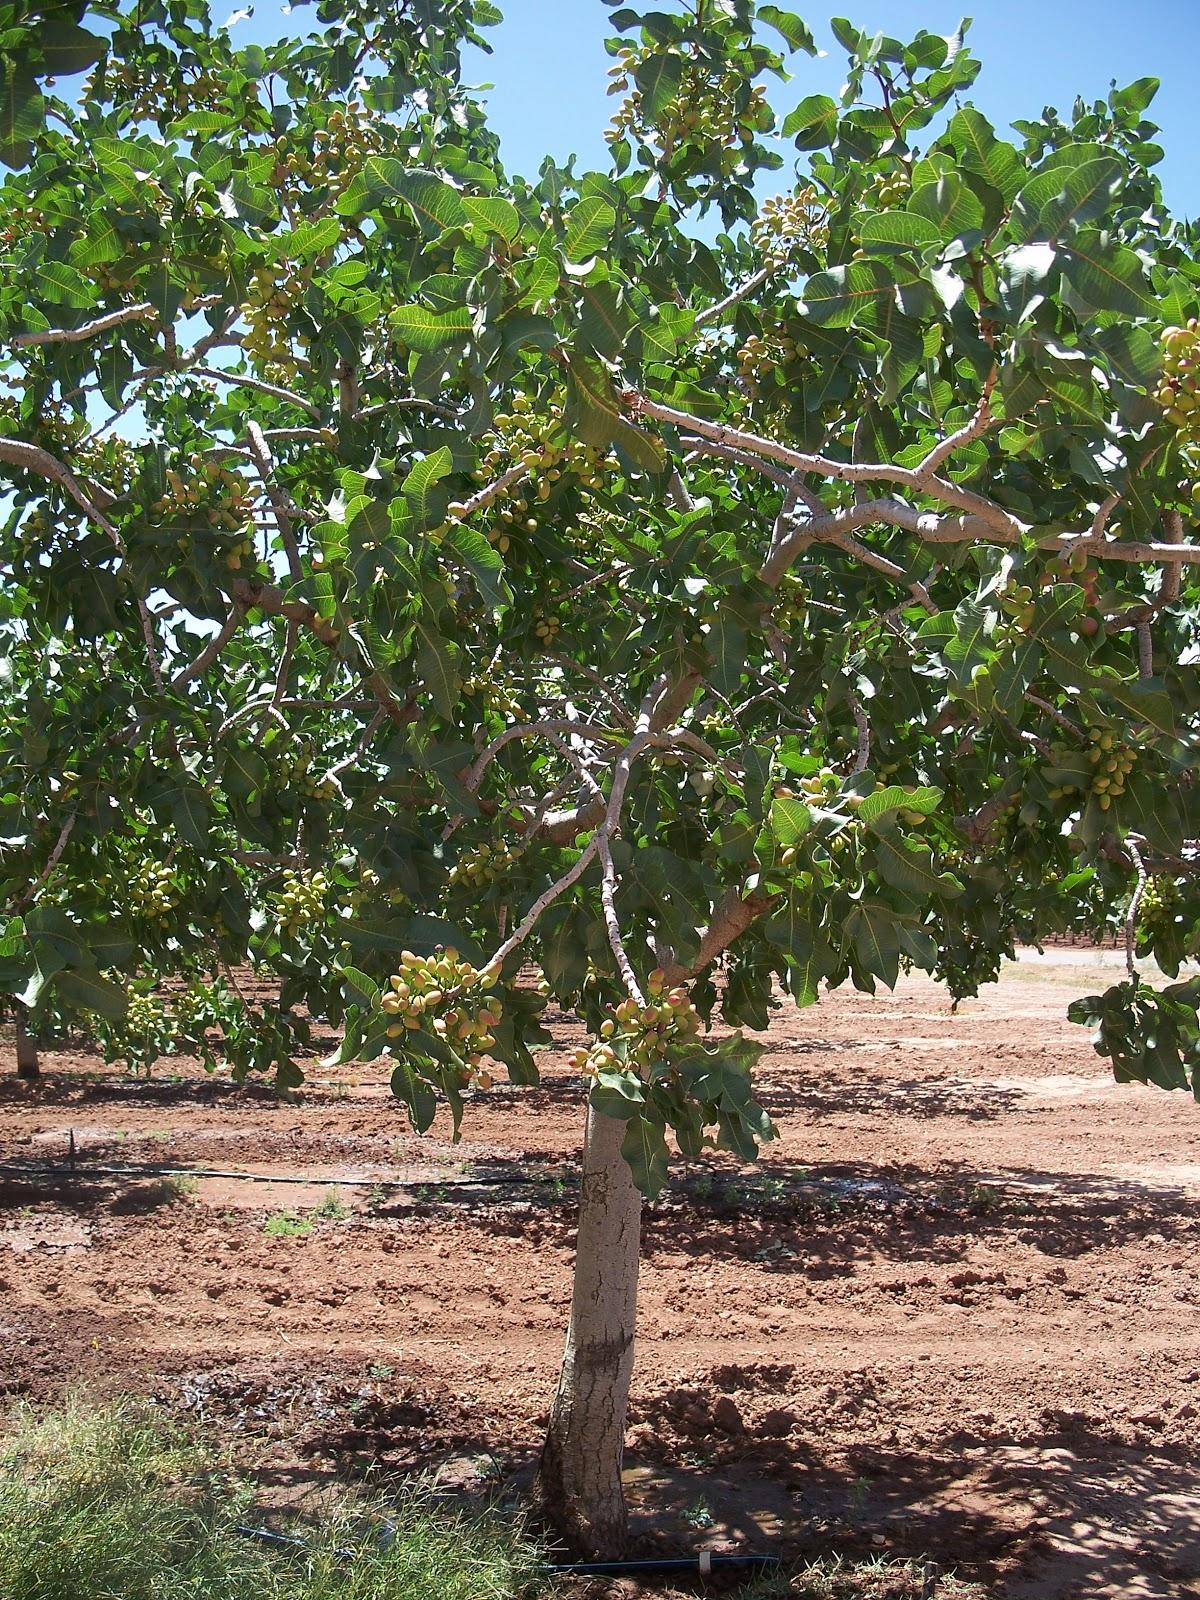 Growing Pistachios: The Road: Eagle Ranch Pistachio Groves